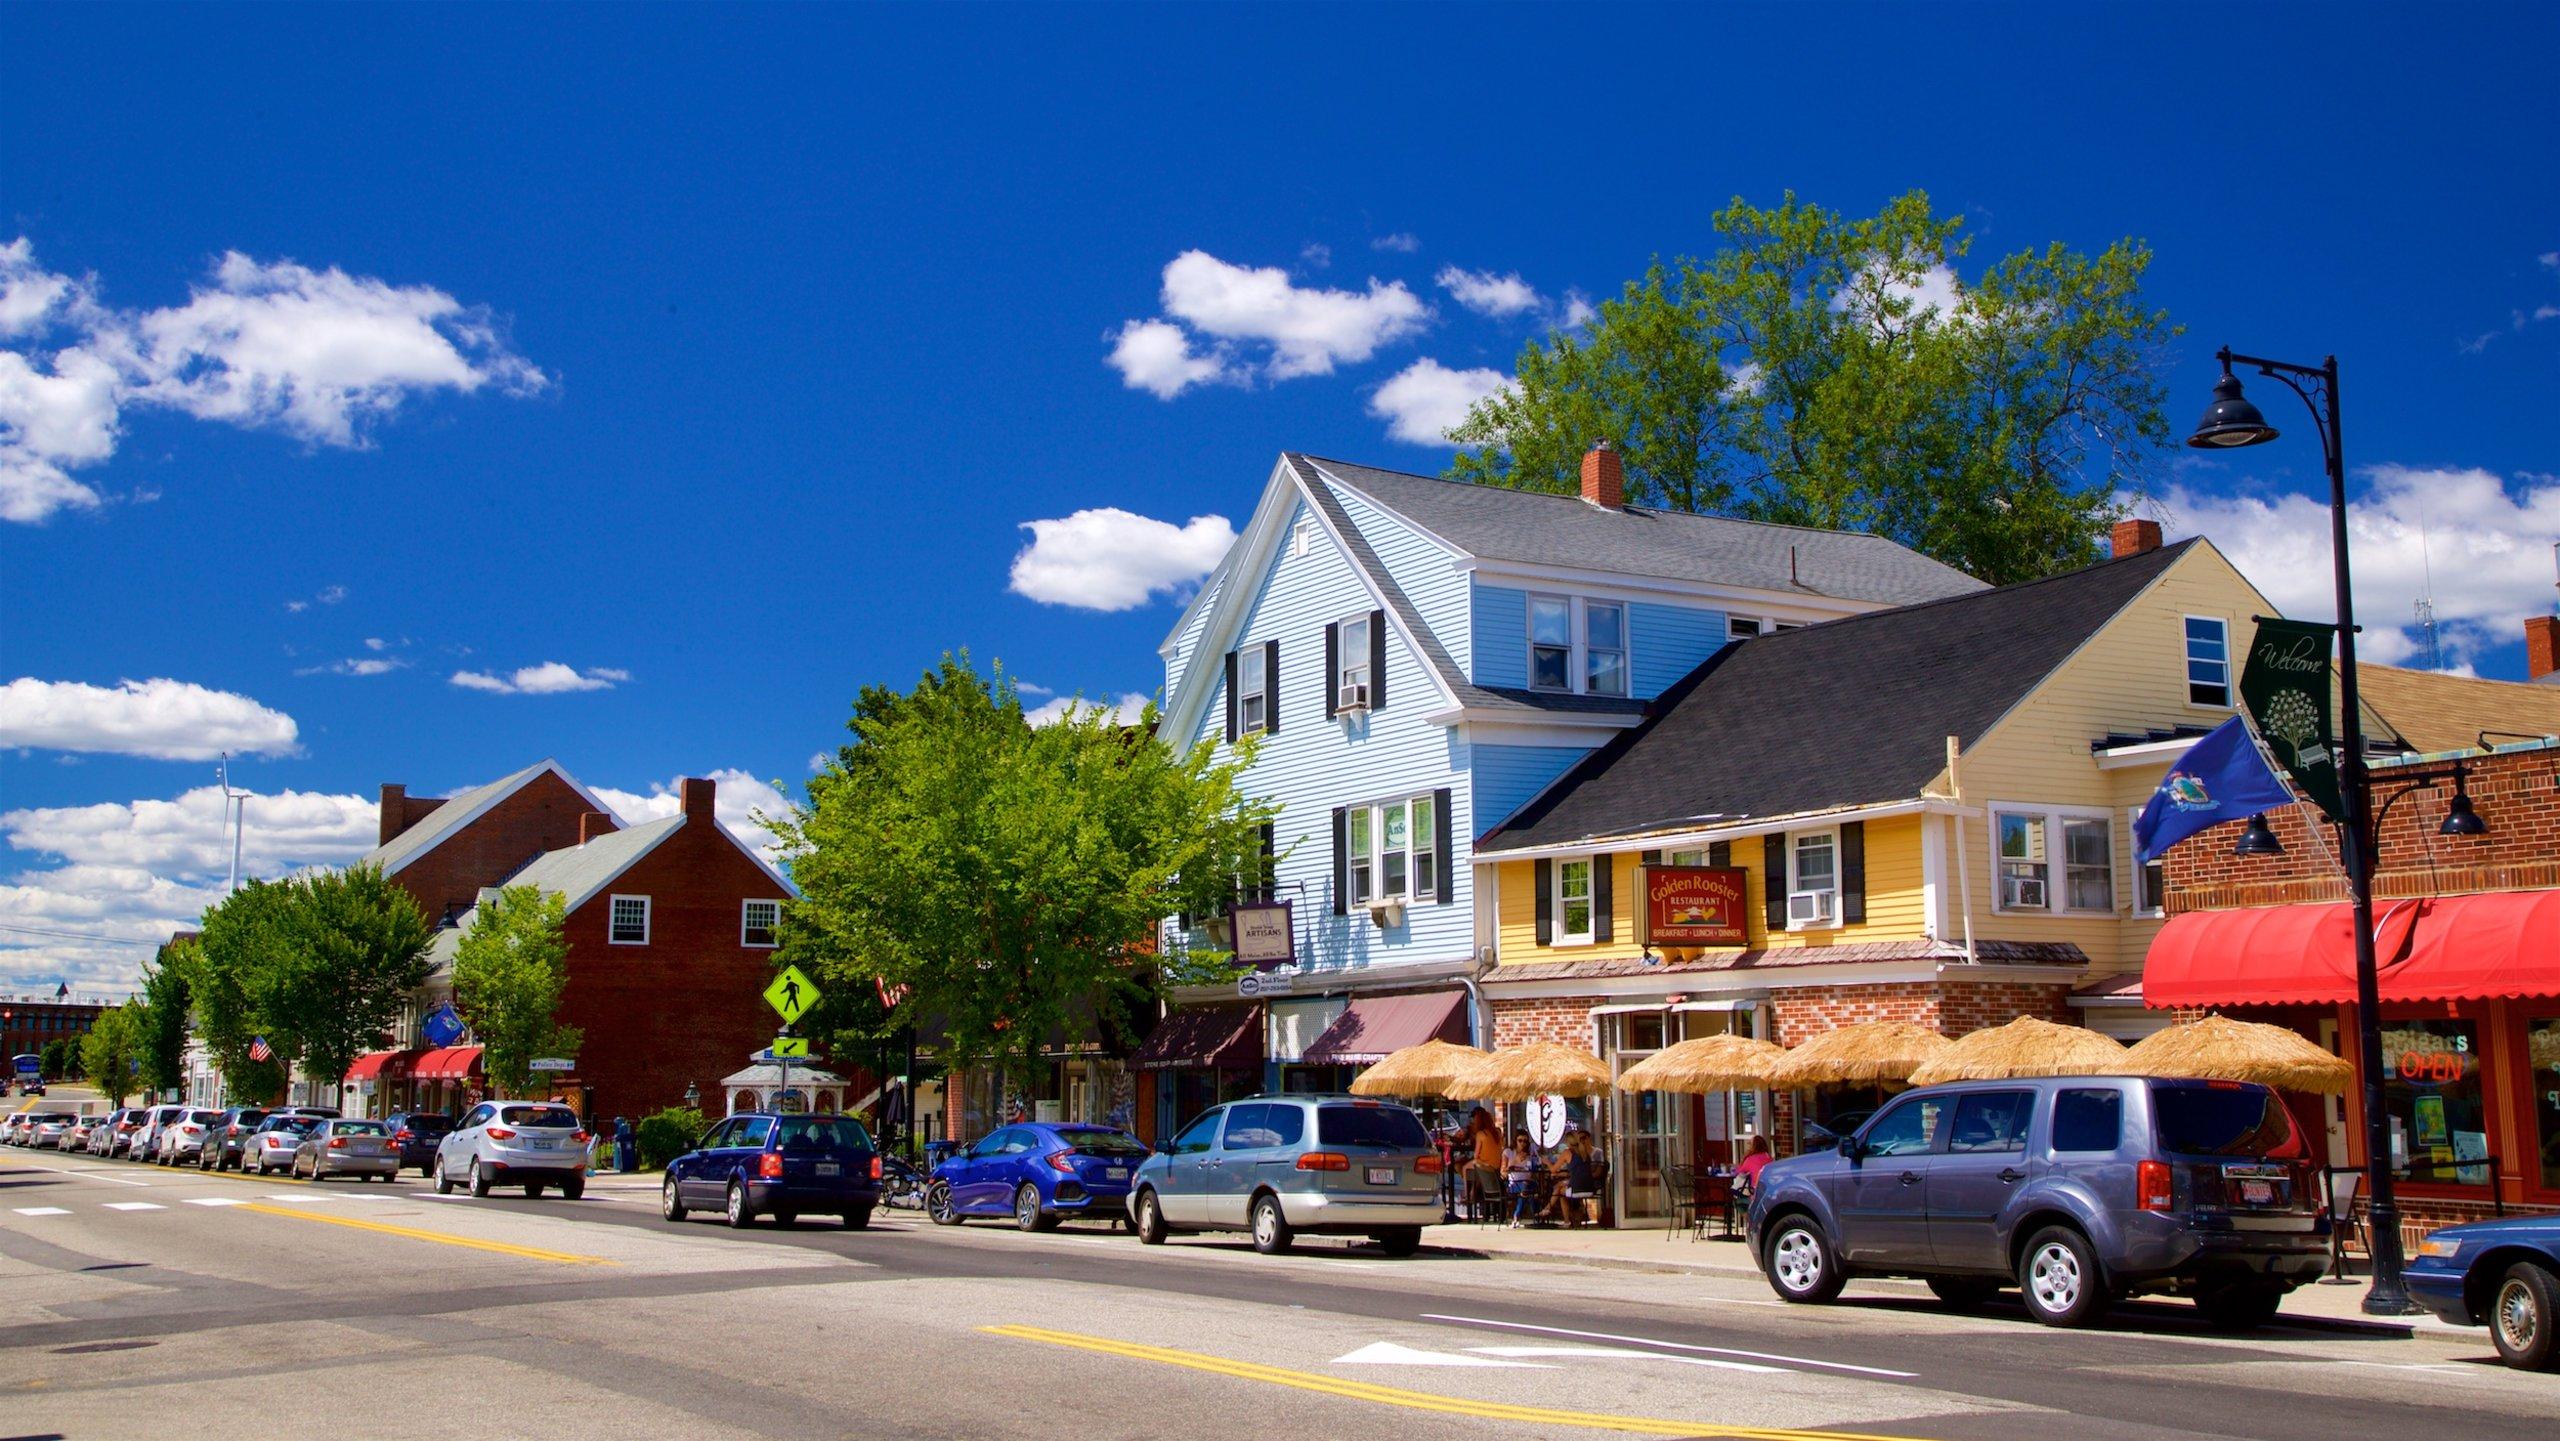 Saco, Maine, United States of America